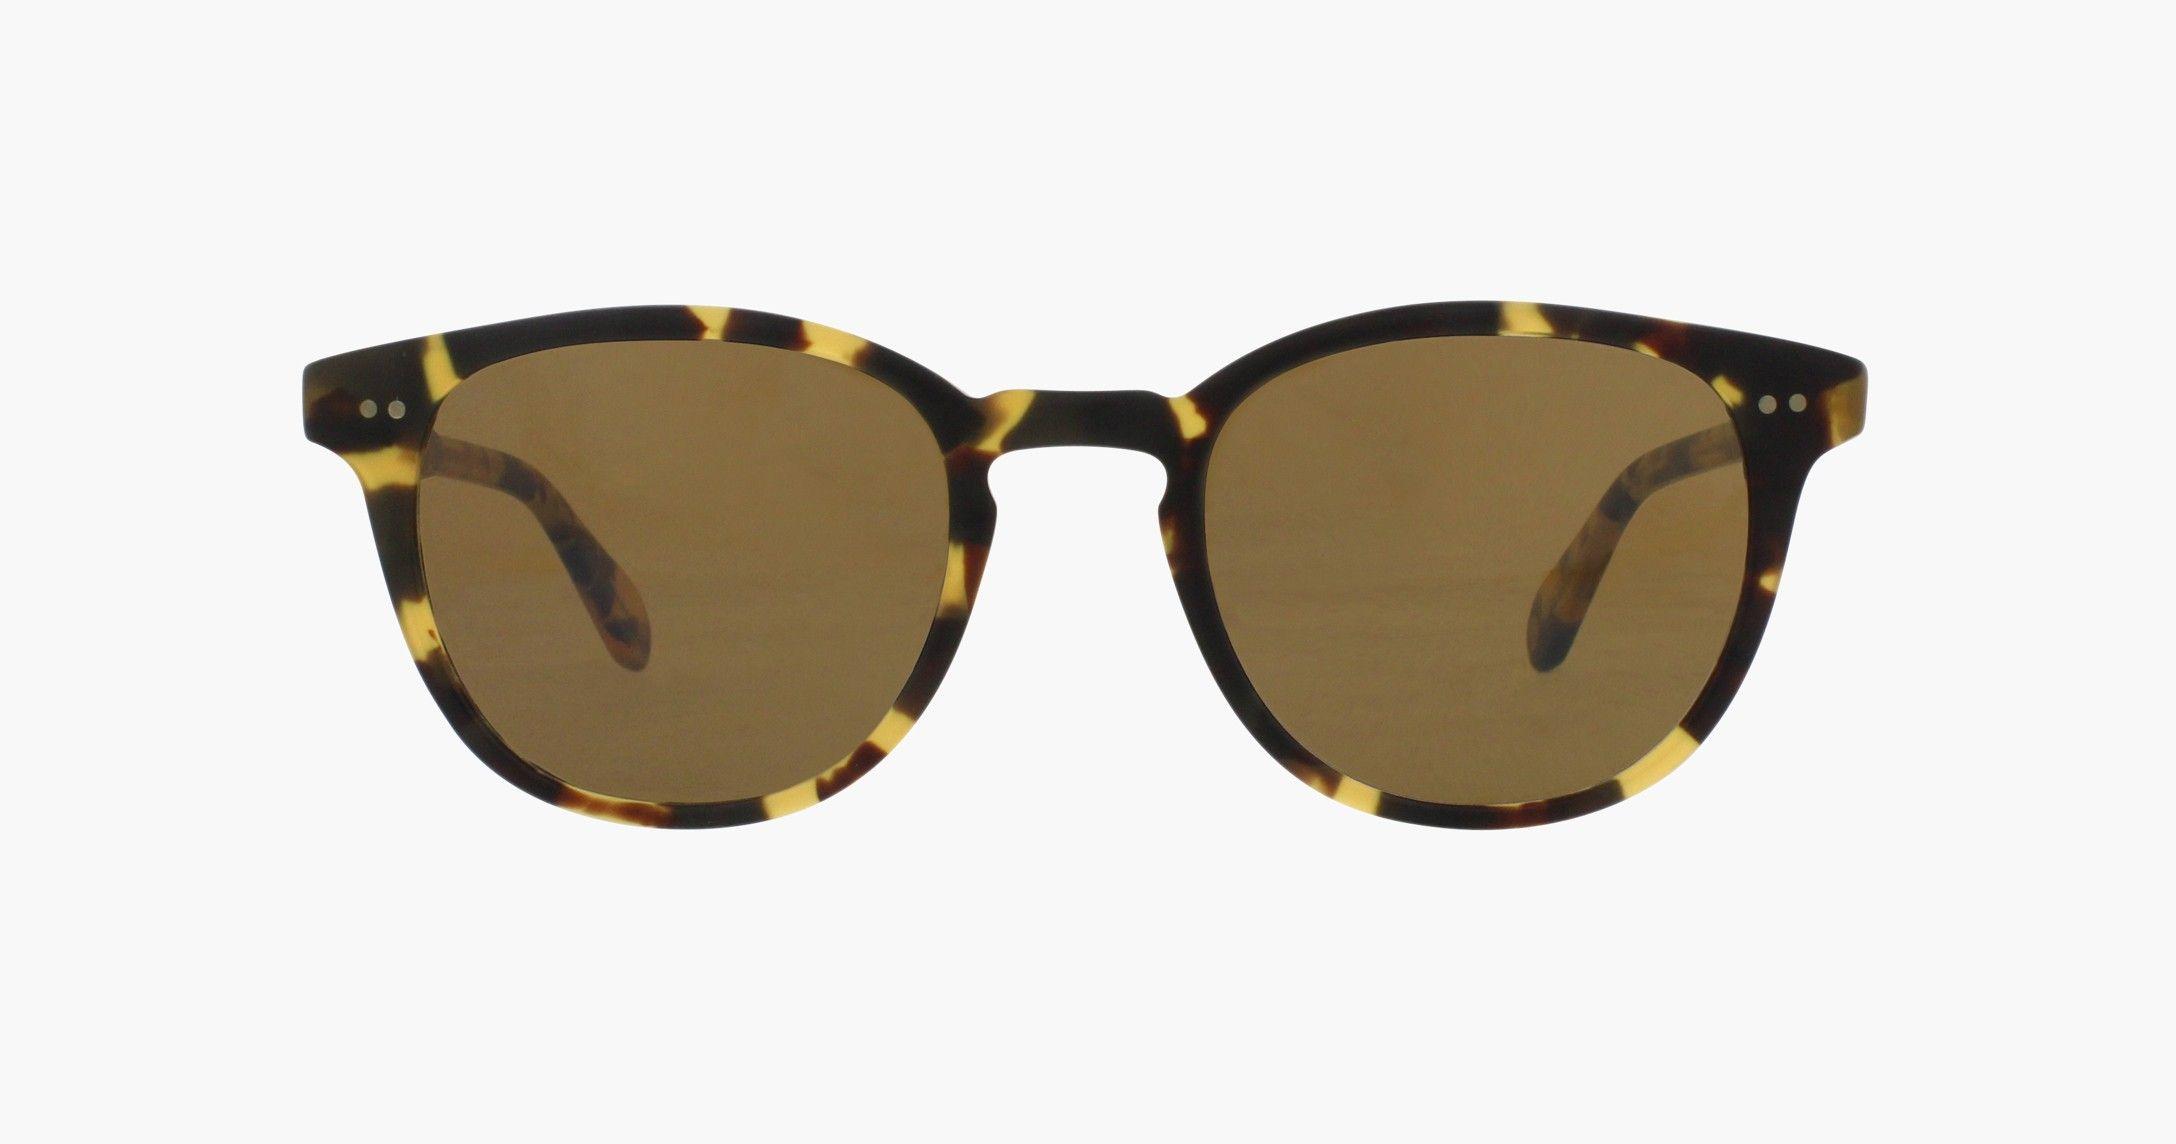 1a5db00f2b7 McKinley Sun - Matte Dark Tortoise with Pure Coffee - Sunglasses